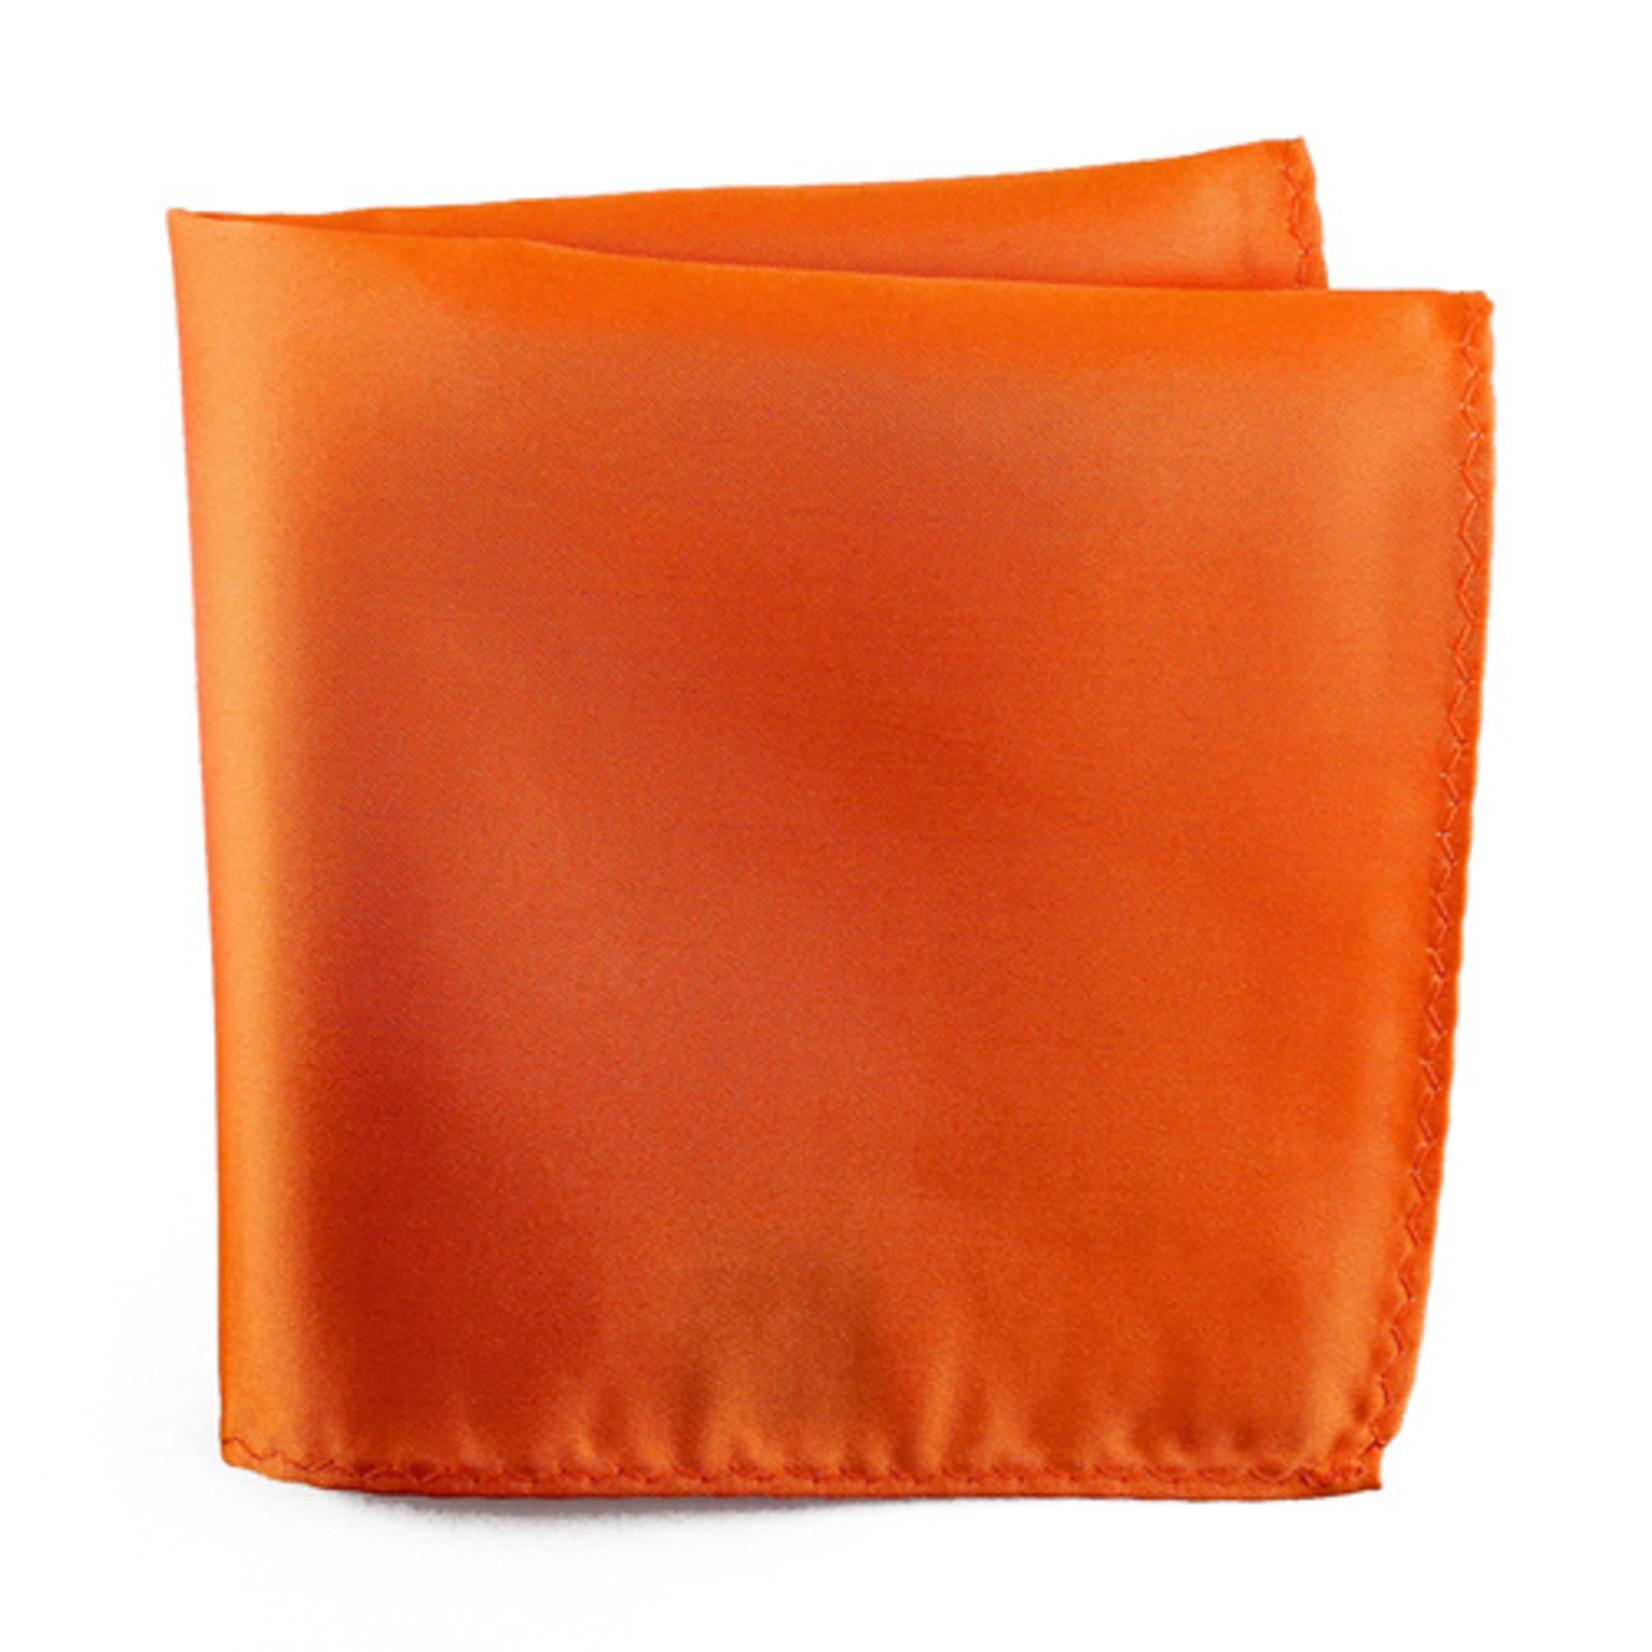 Knotz M100PSQ-10 Solid Orange Pocket Square